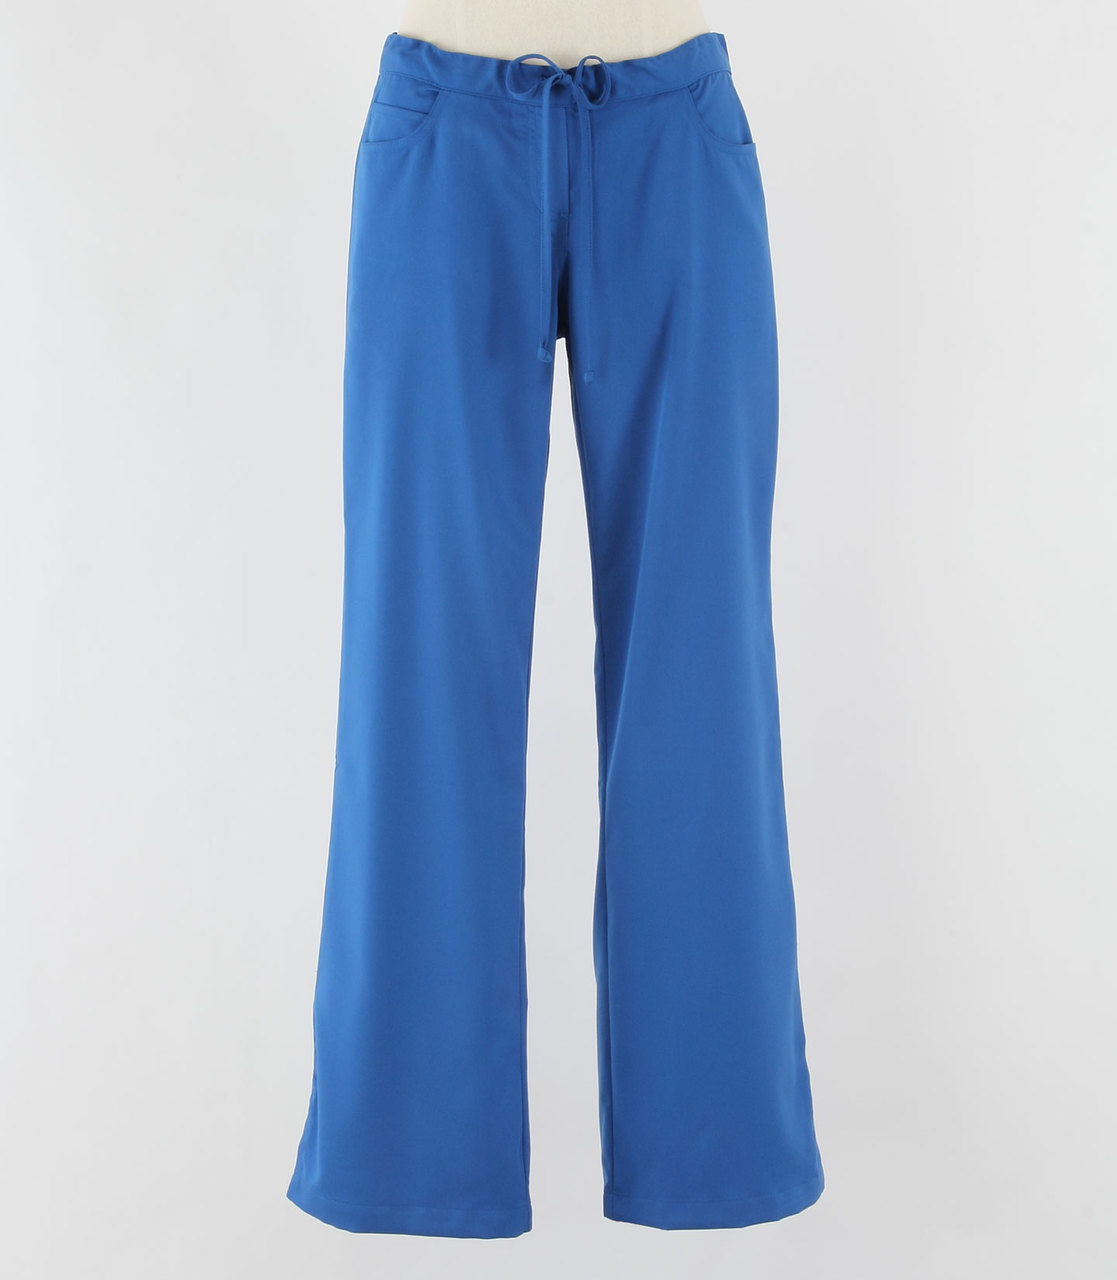 1d24176e993 Greys Anatomy Womens Scrub Pants New Royal - Scrub Med